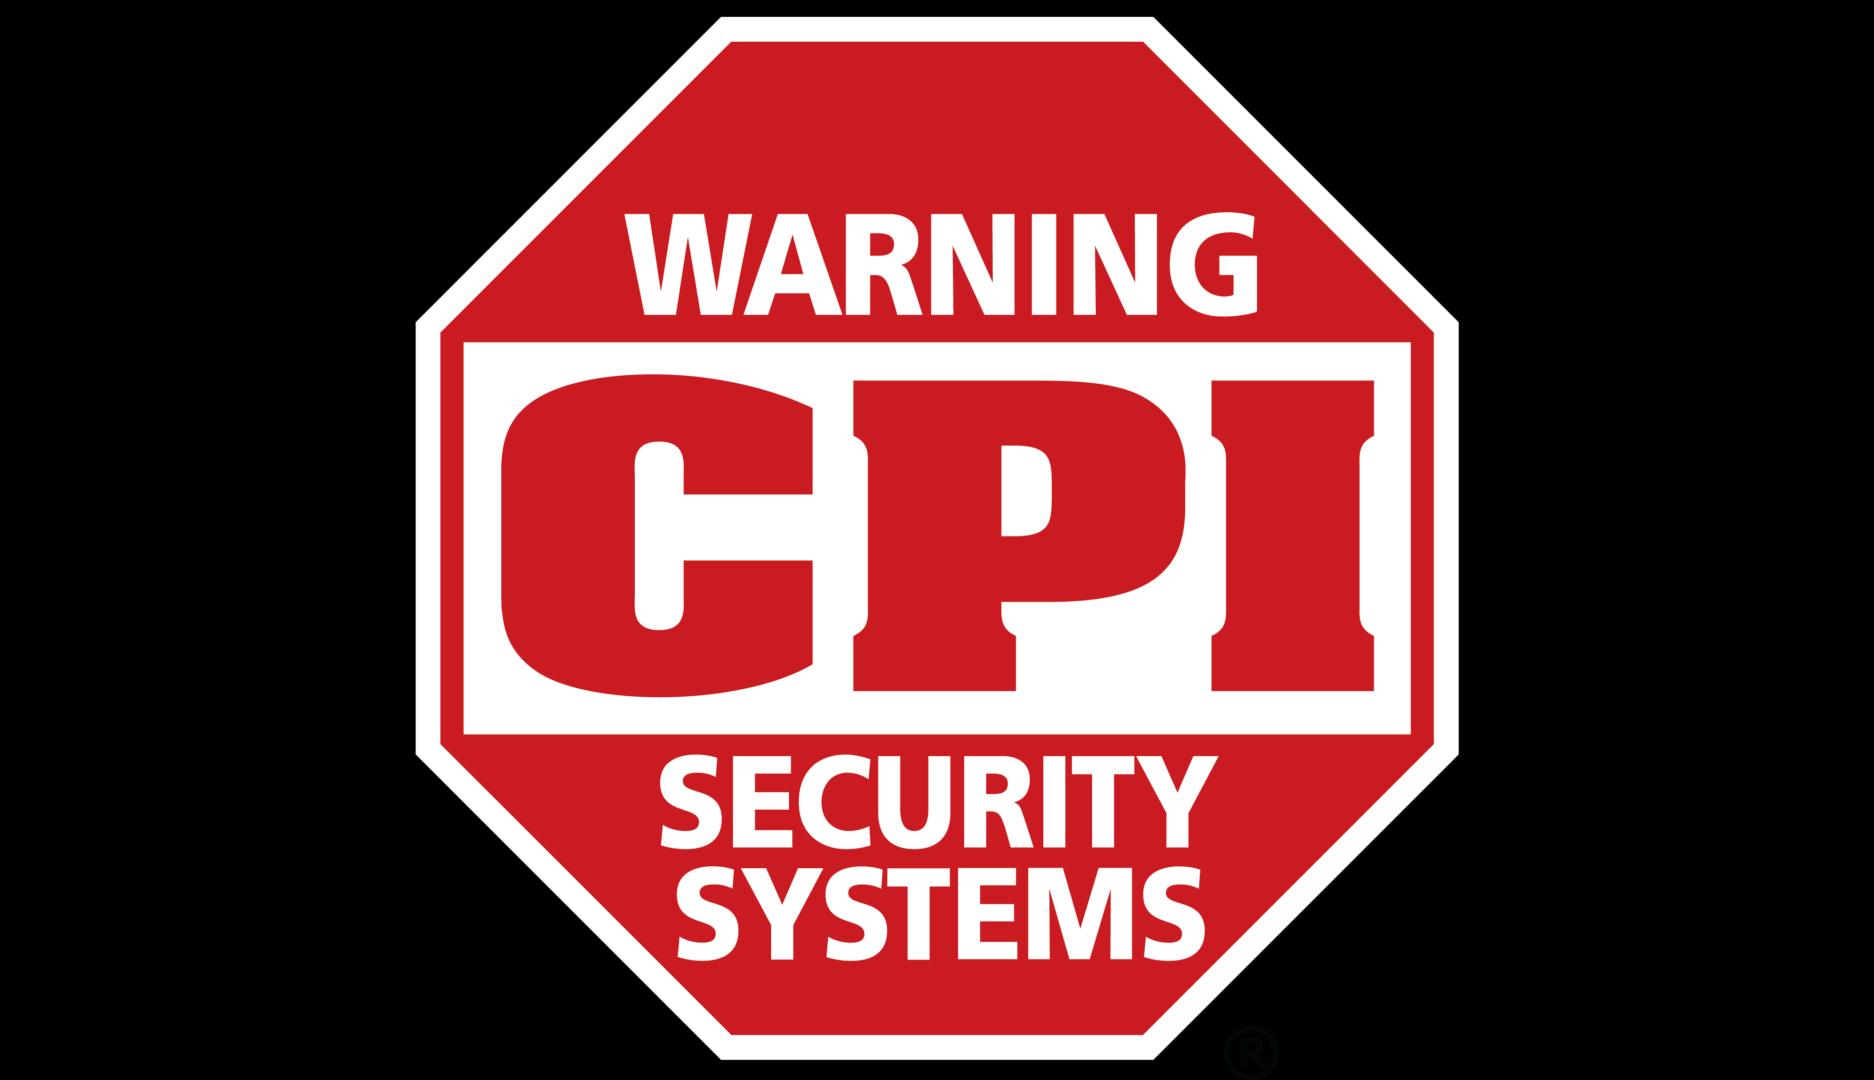 https://secureservercdn.net/198.71.233.179/mjf.381.myftpupload.com/wp-content/uploads/2021/07/CPI-octagon.png